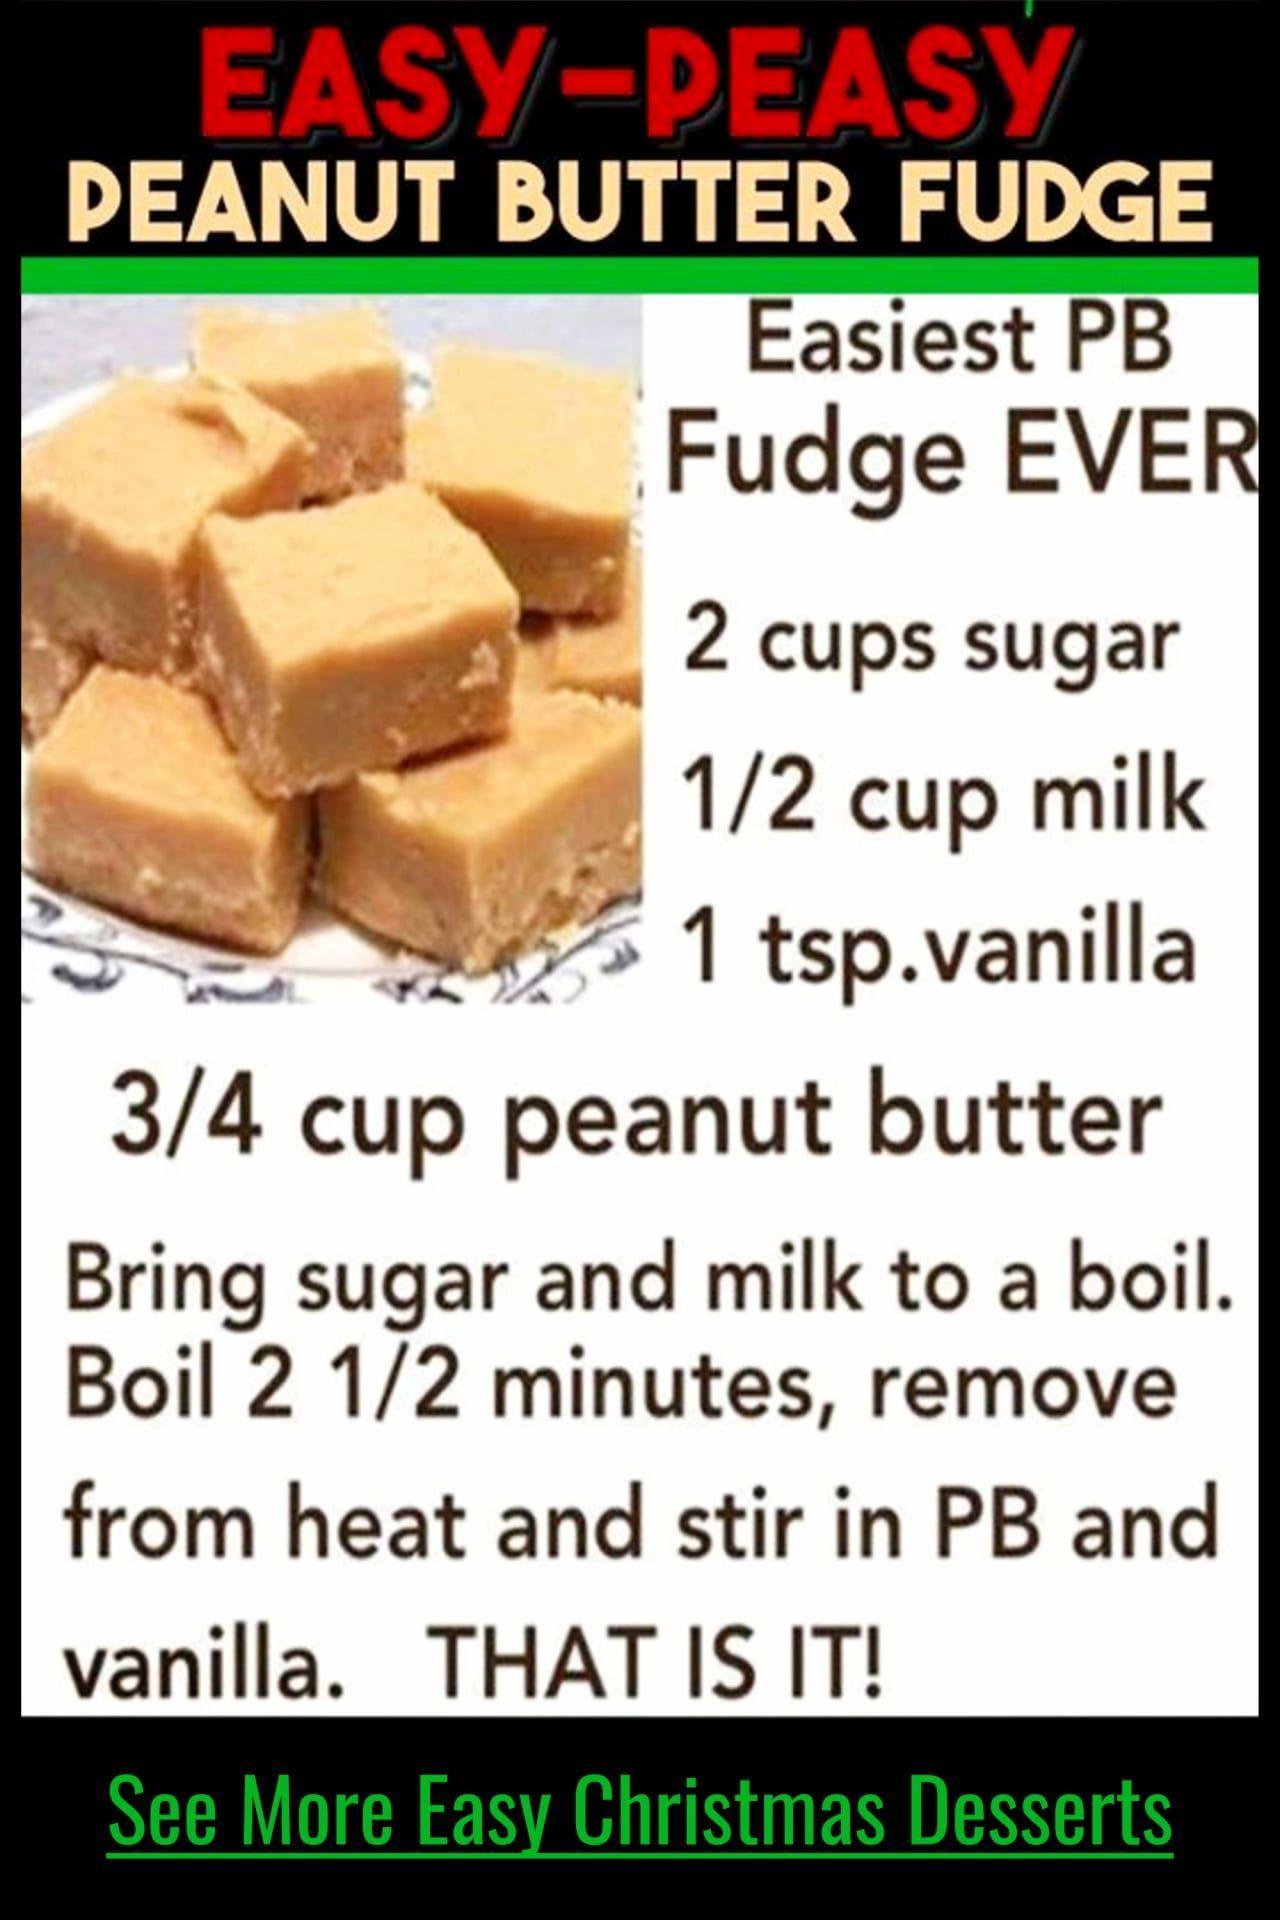 Easy Fudge Recipe Without Condensed Milk Quick And Simple Peanut Butter In 2020 Peanut Butter Fudge Recipes Easy Easy Fudge Recipe Without Condensed Milk Fudge Easy